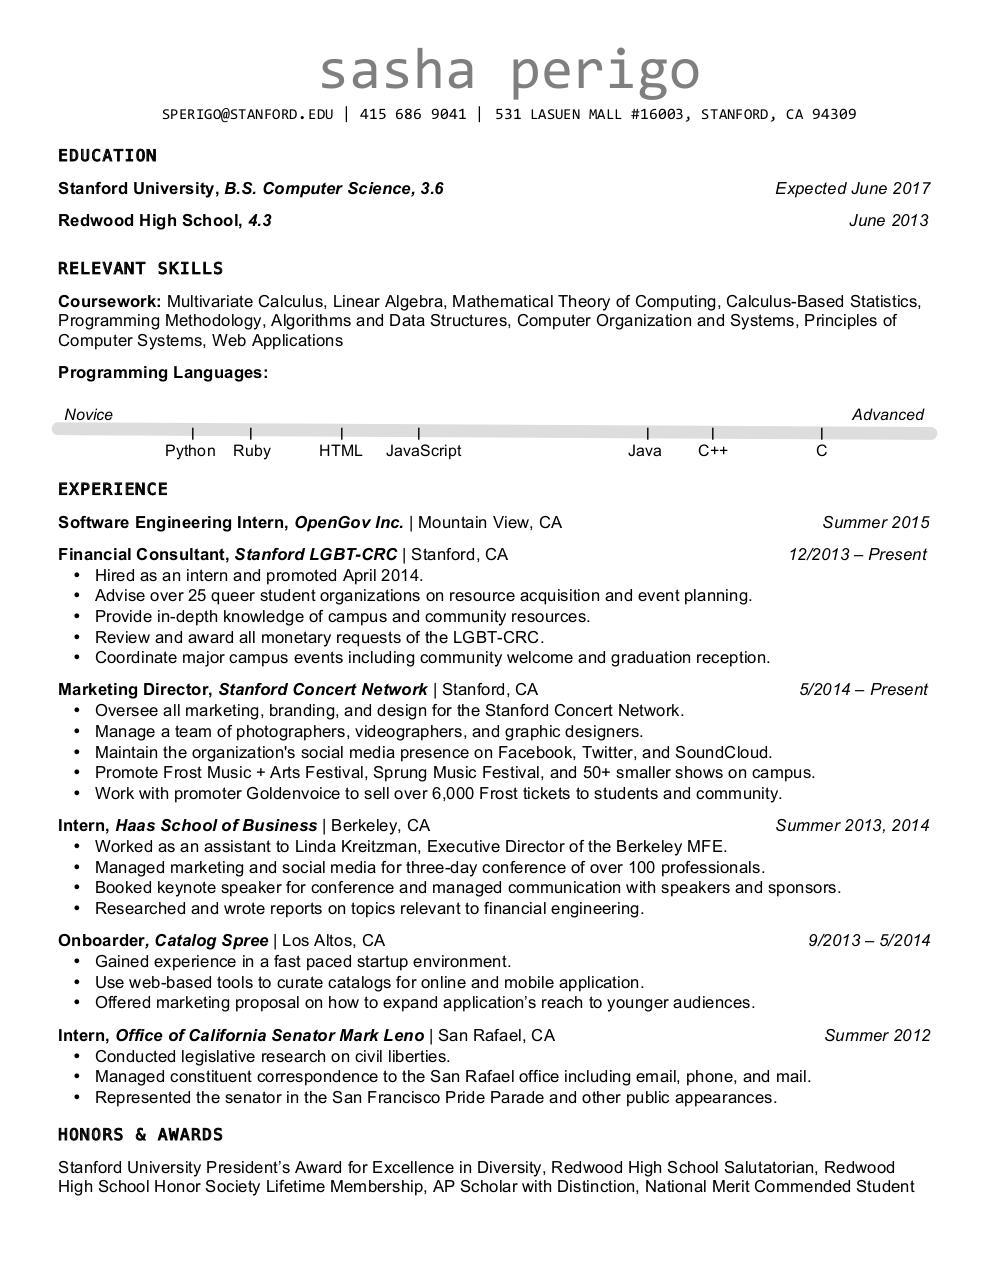 ghc scholarship resume docx - ghc-scholarship-resume-2 pdf - PDF Archive